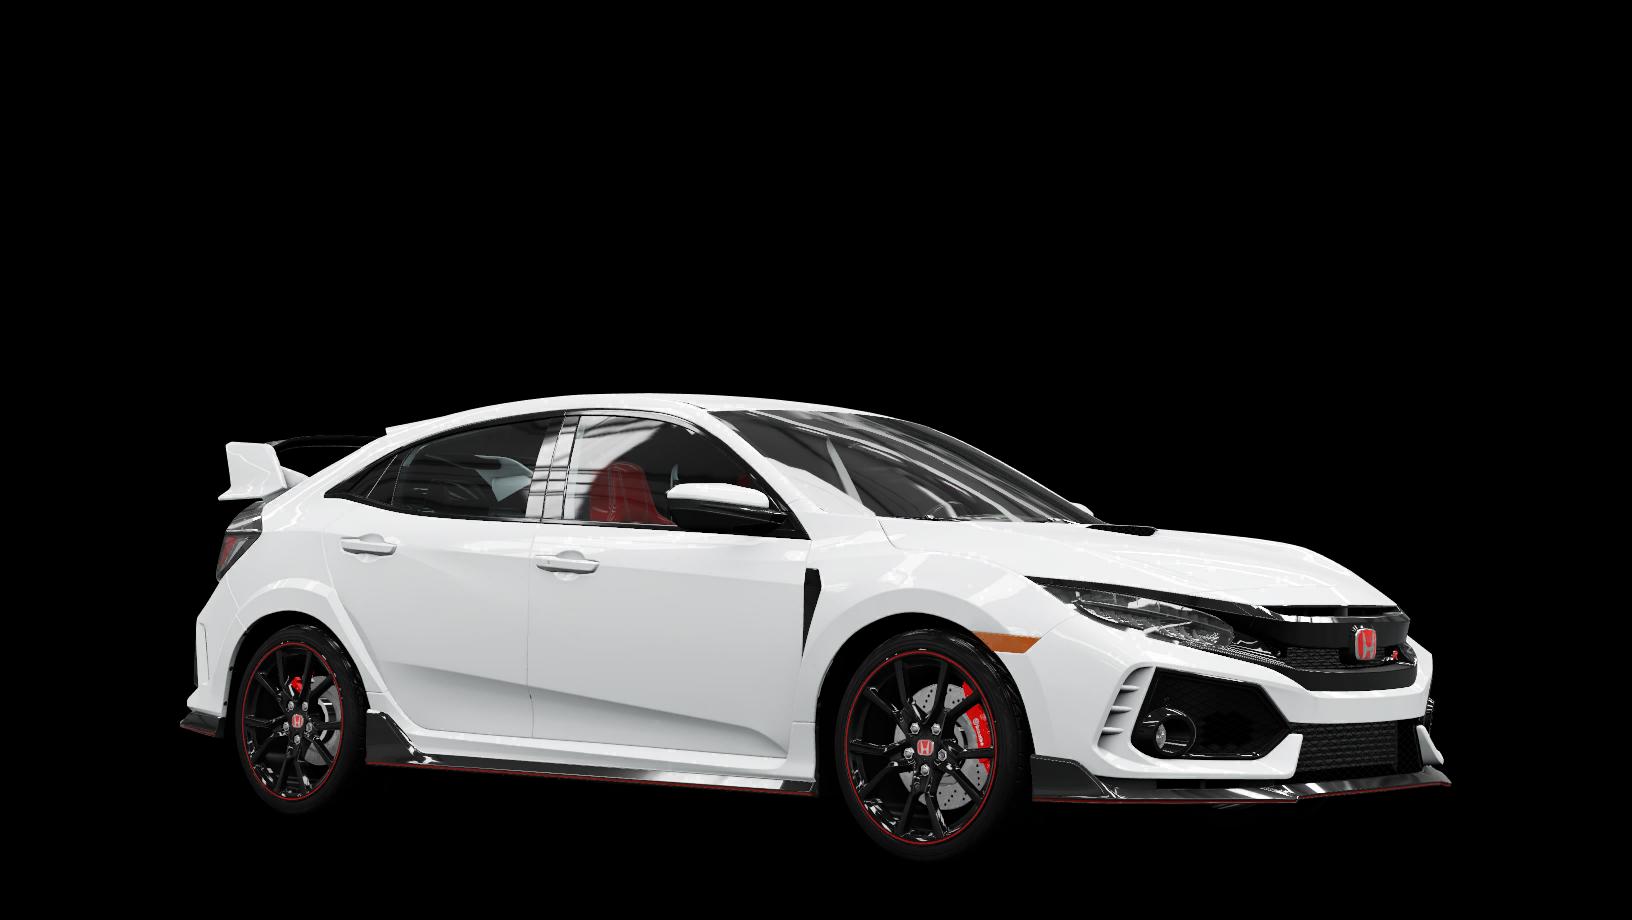 Honda Civic Type R 2018 Forza Wiki Fandom